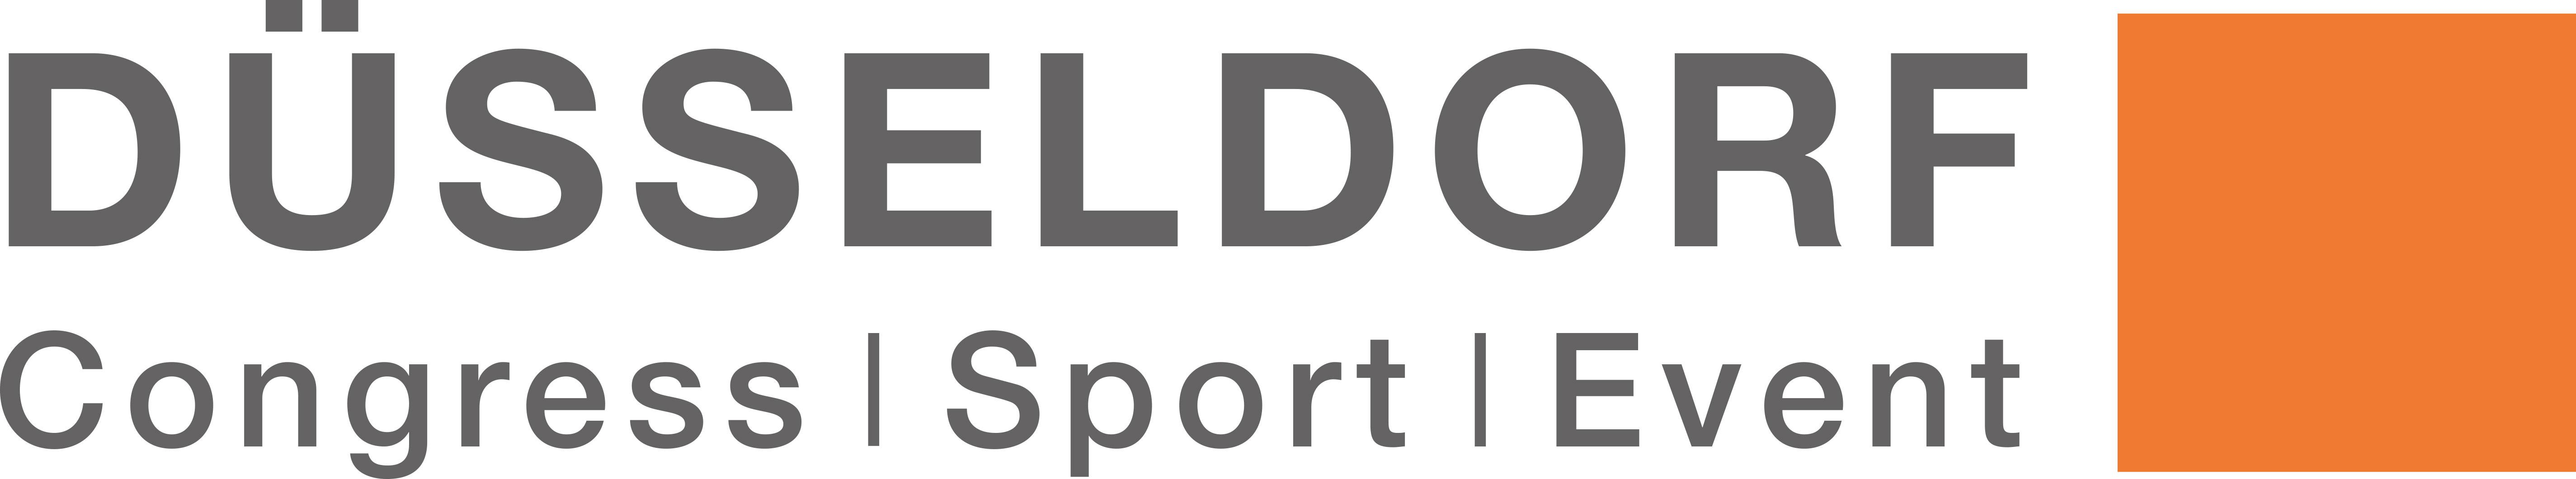 Dusseldorf Congress Sport Event